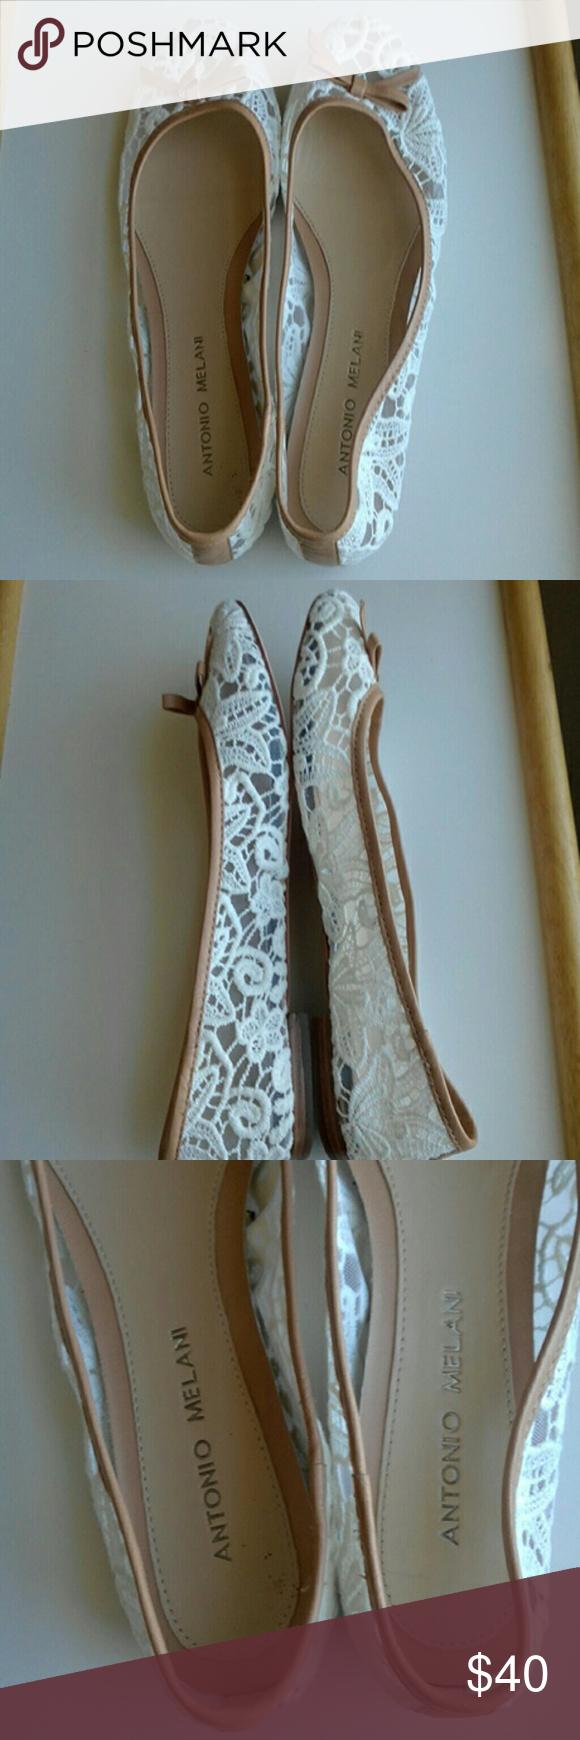 Ladies' Antonio Melani Shoes - NWoT White Antonio Melani lace with brown leather trim. Great for cas...